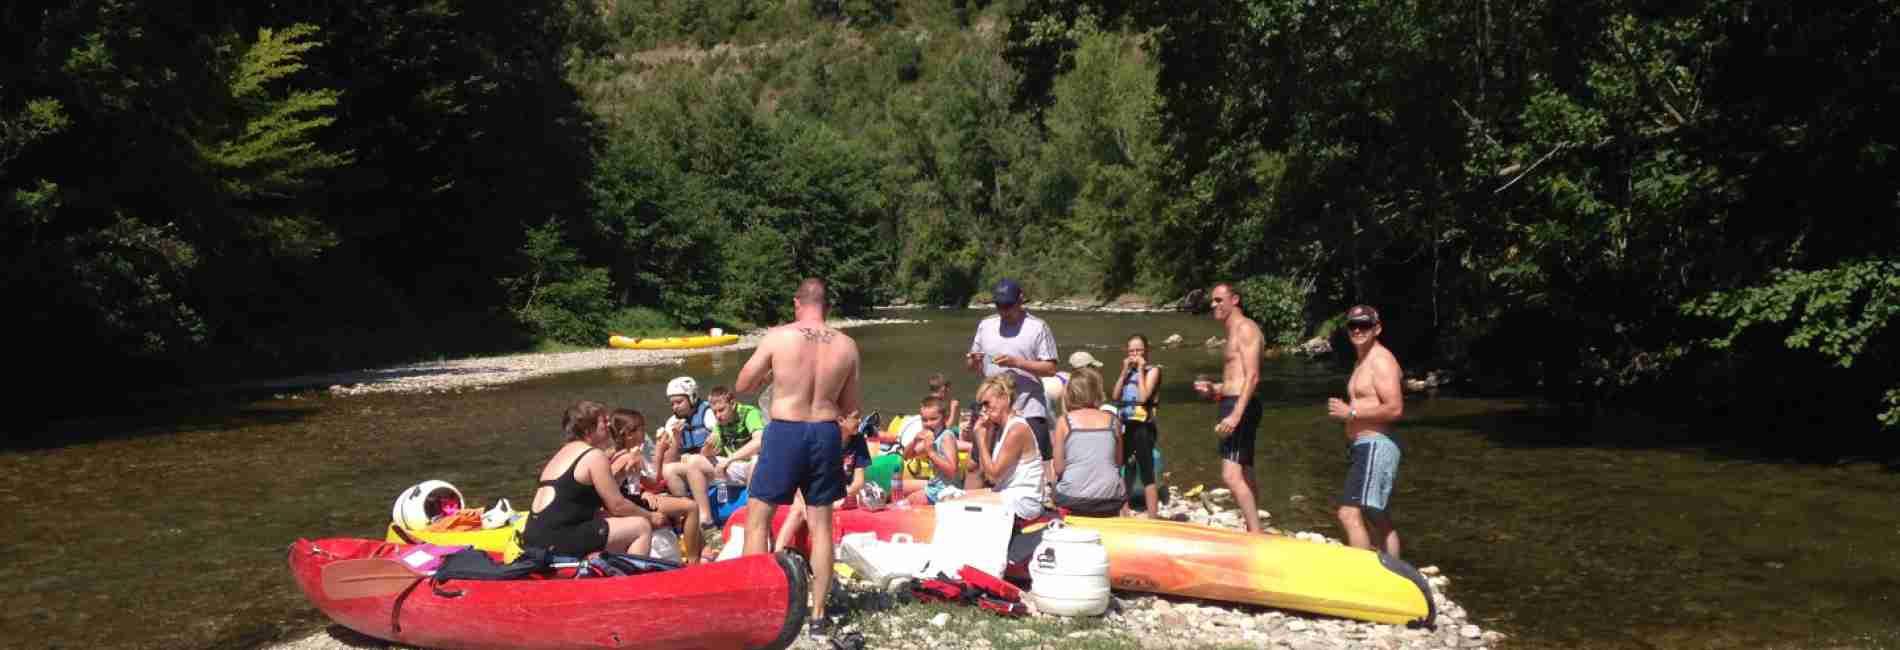 kayak-village-vacance.jpg